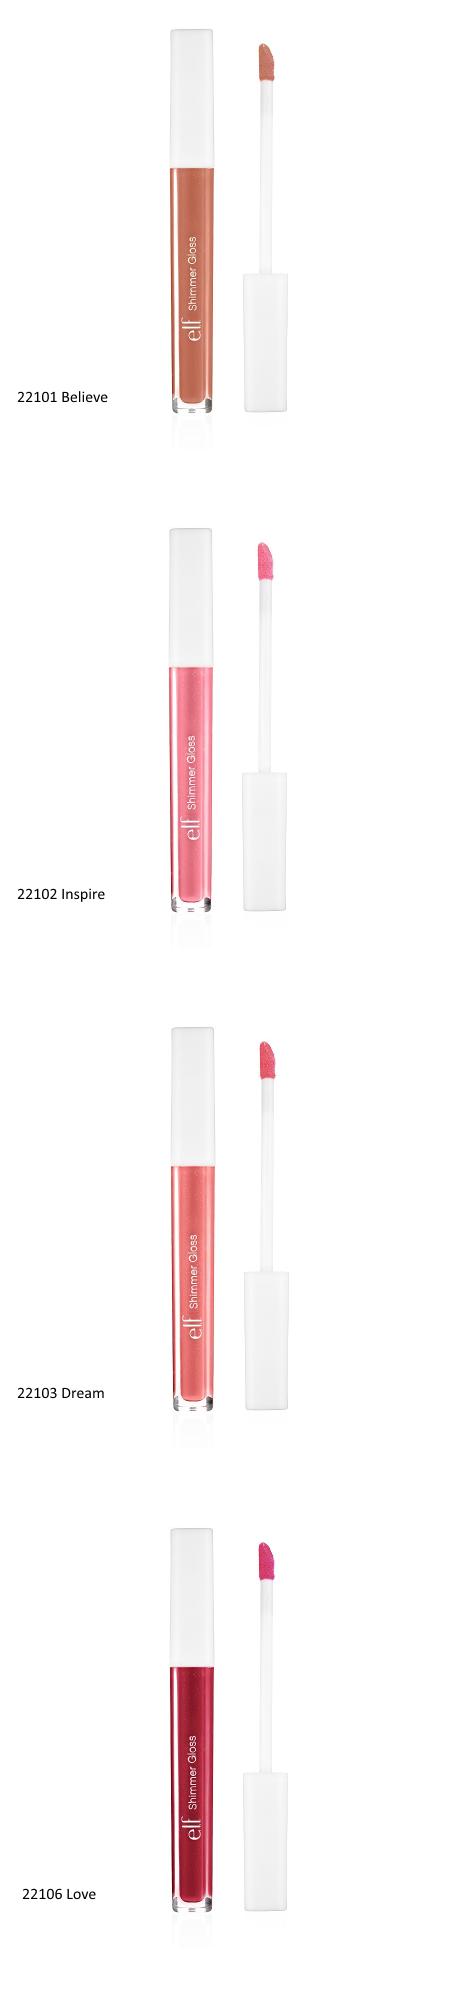 e.l.f. Essential Shimmer Lip Gloss